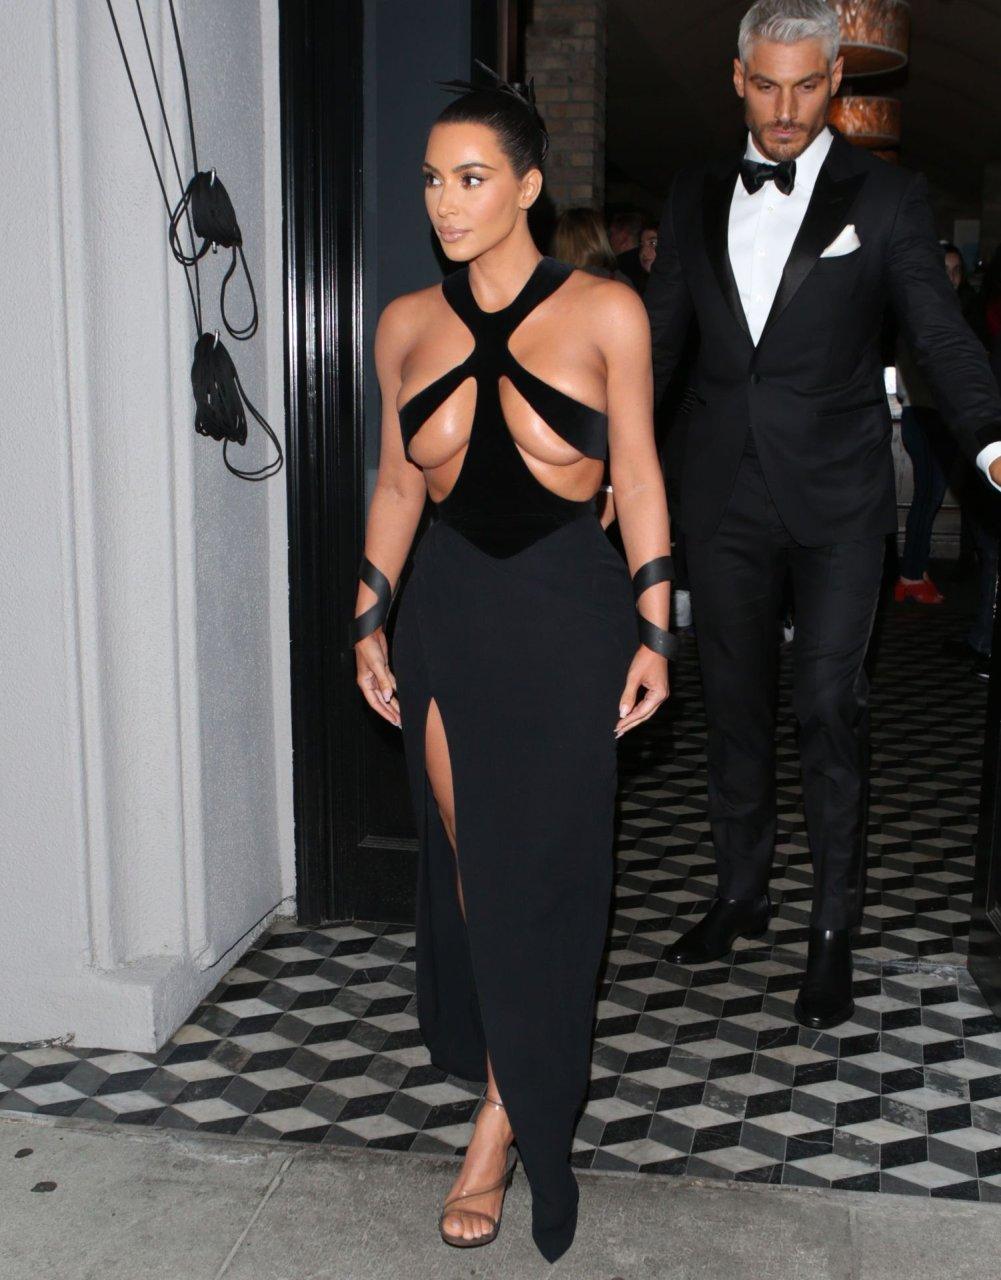 Kim-Kardashian-Topless-TheFappeningBlog.com-6.jpg